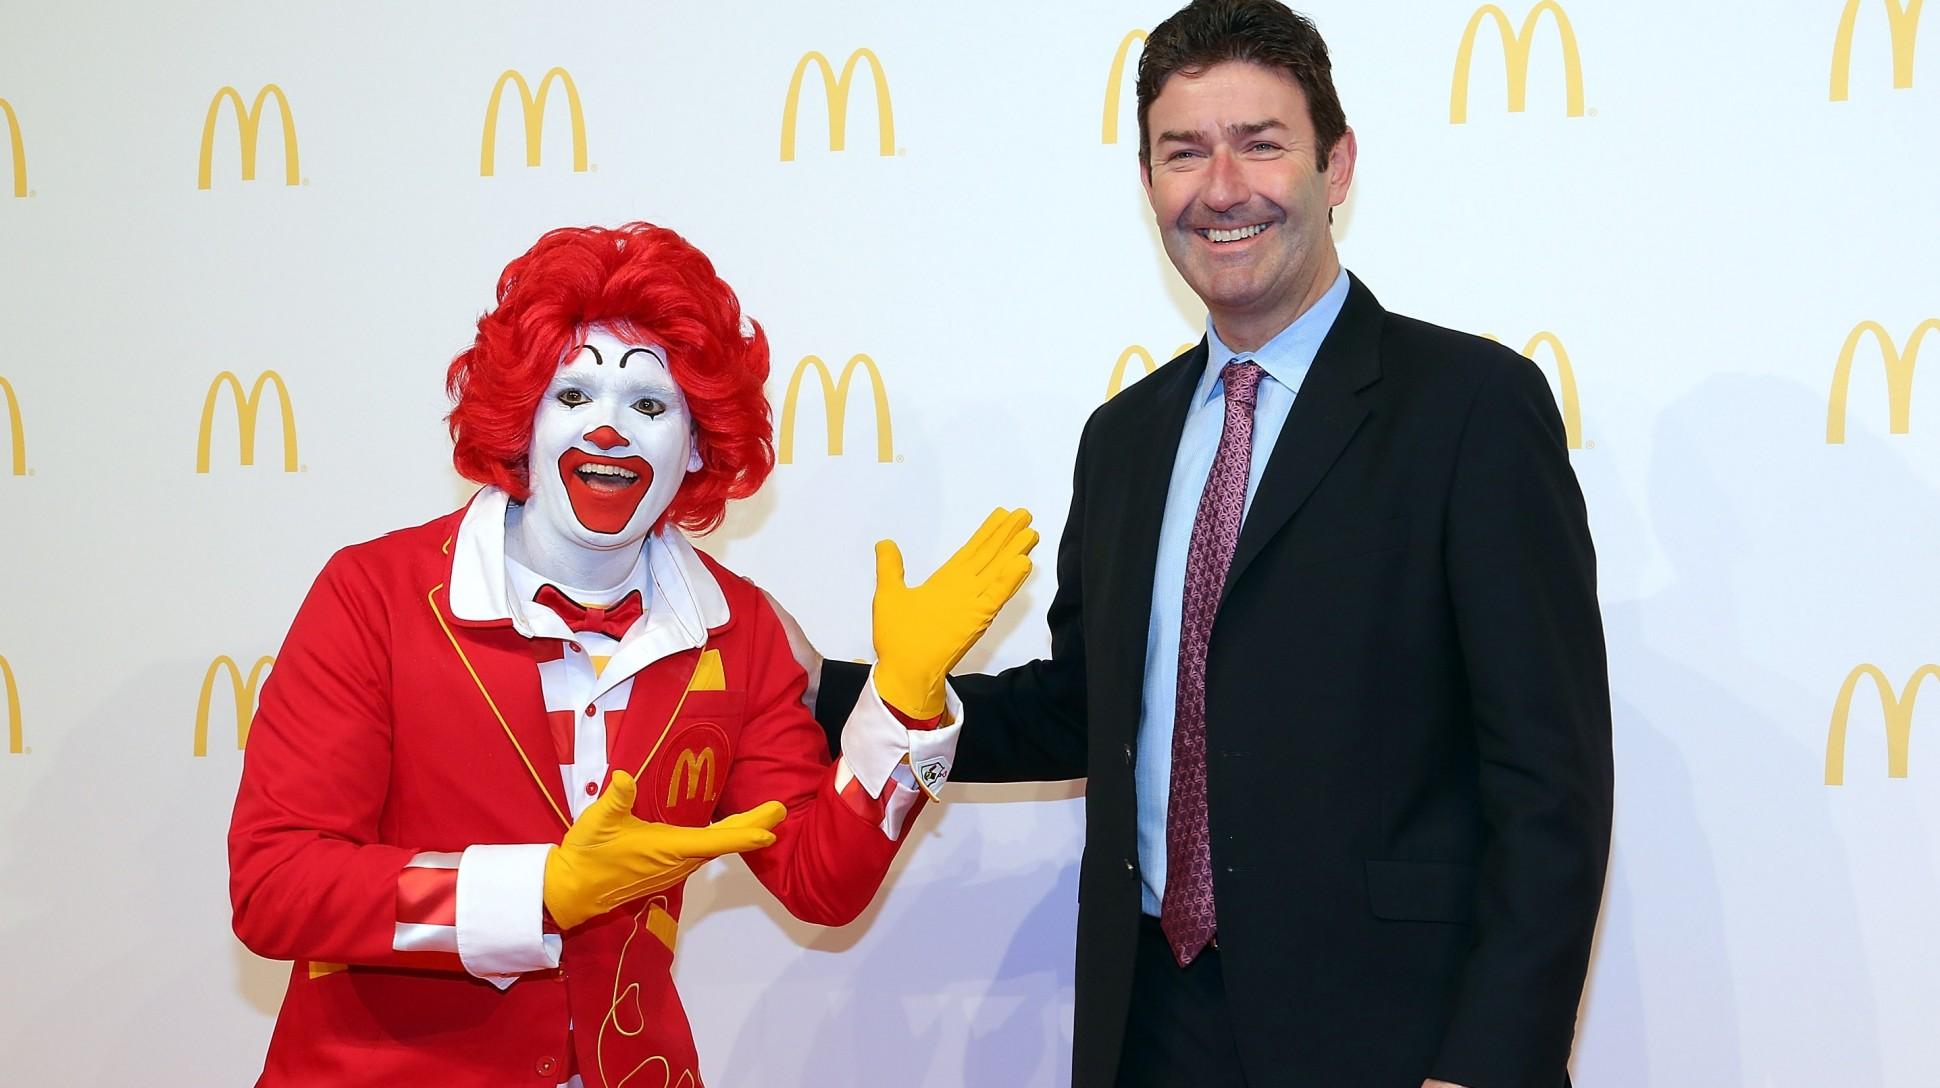 McDonald's Turnaround Plan Marked by Bizarre Beginning